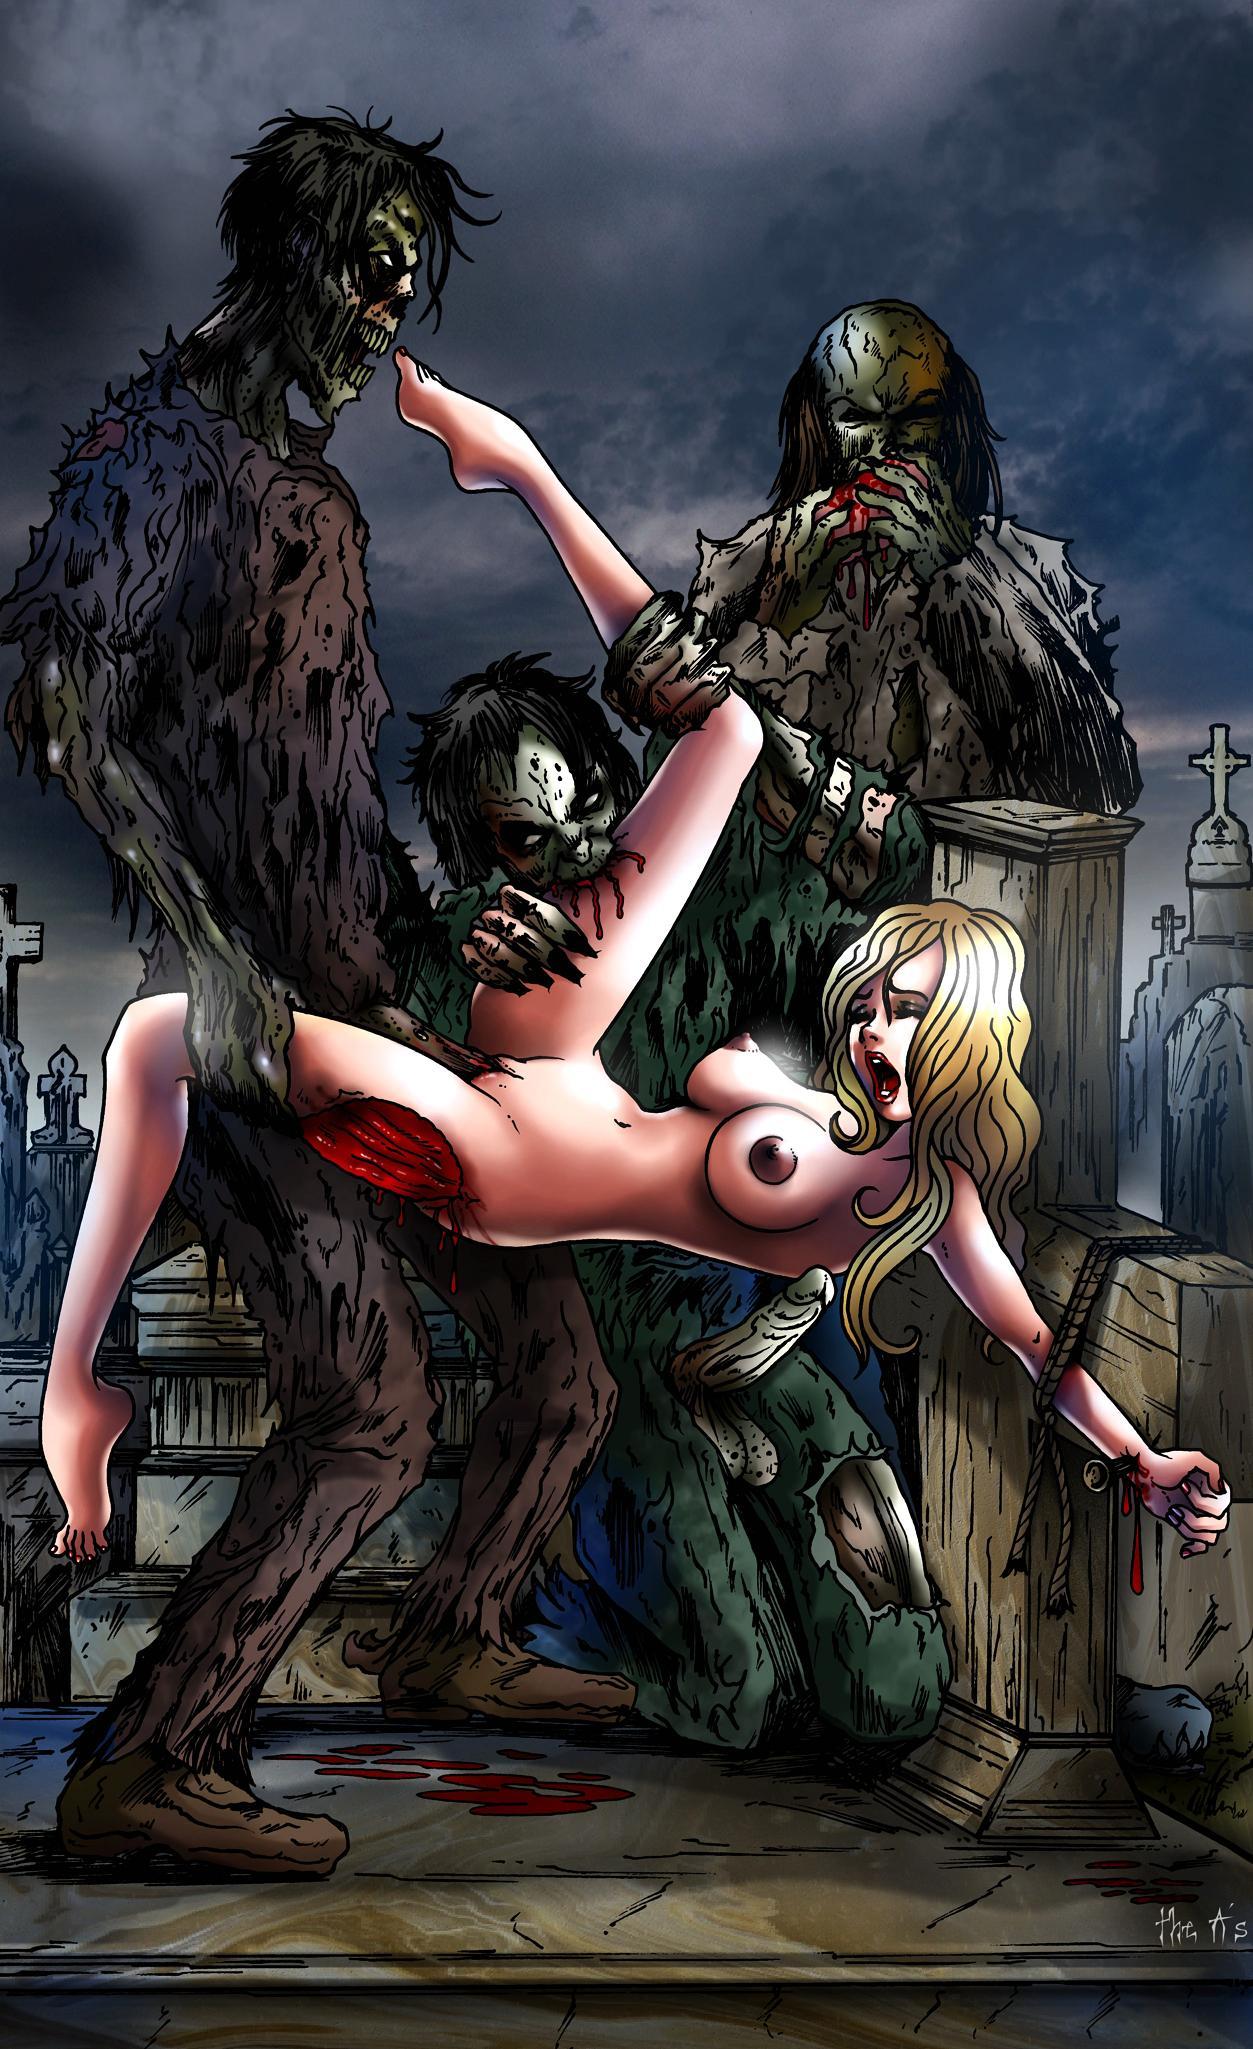 Zombie sex cartoon pictures porncraft videos